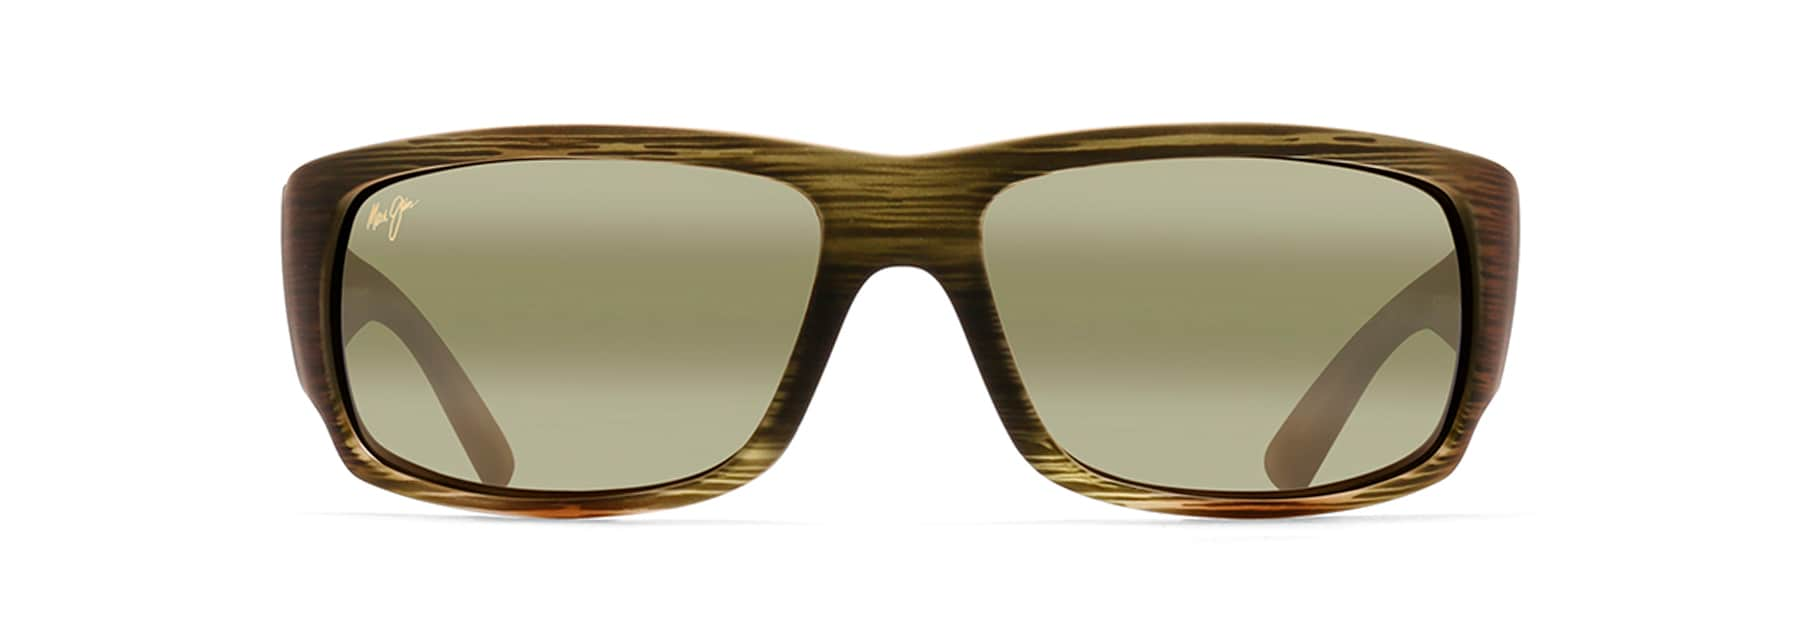 31e14b17b34 World Cup Polarized Sunglasses   Maui Jim®